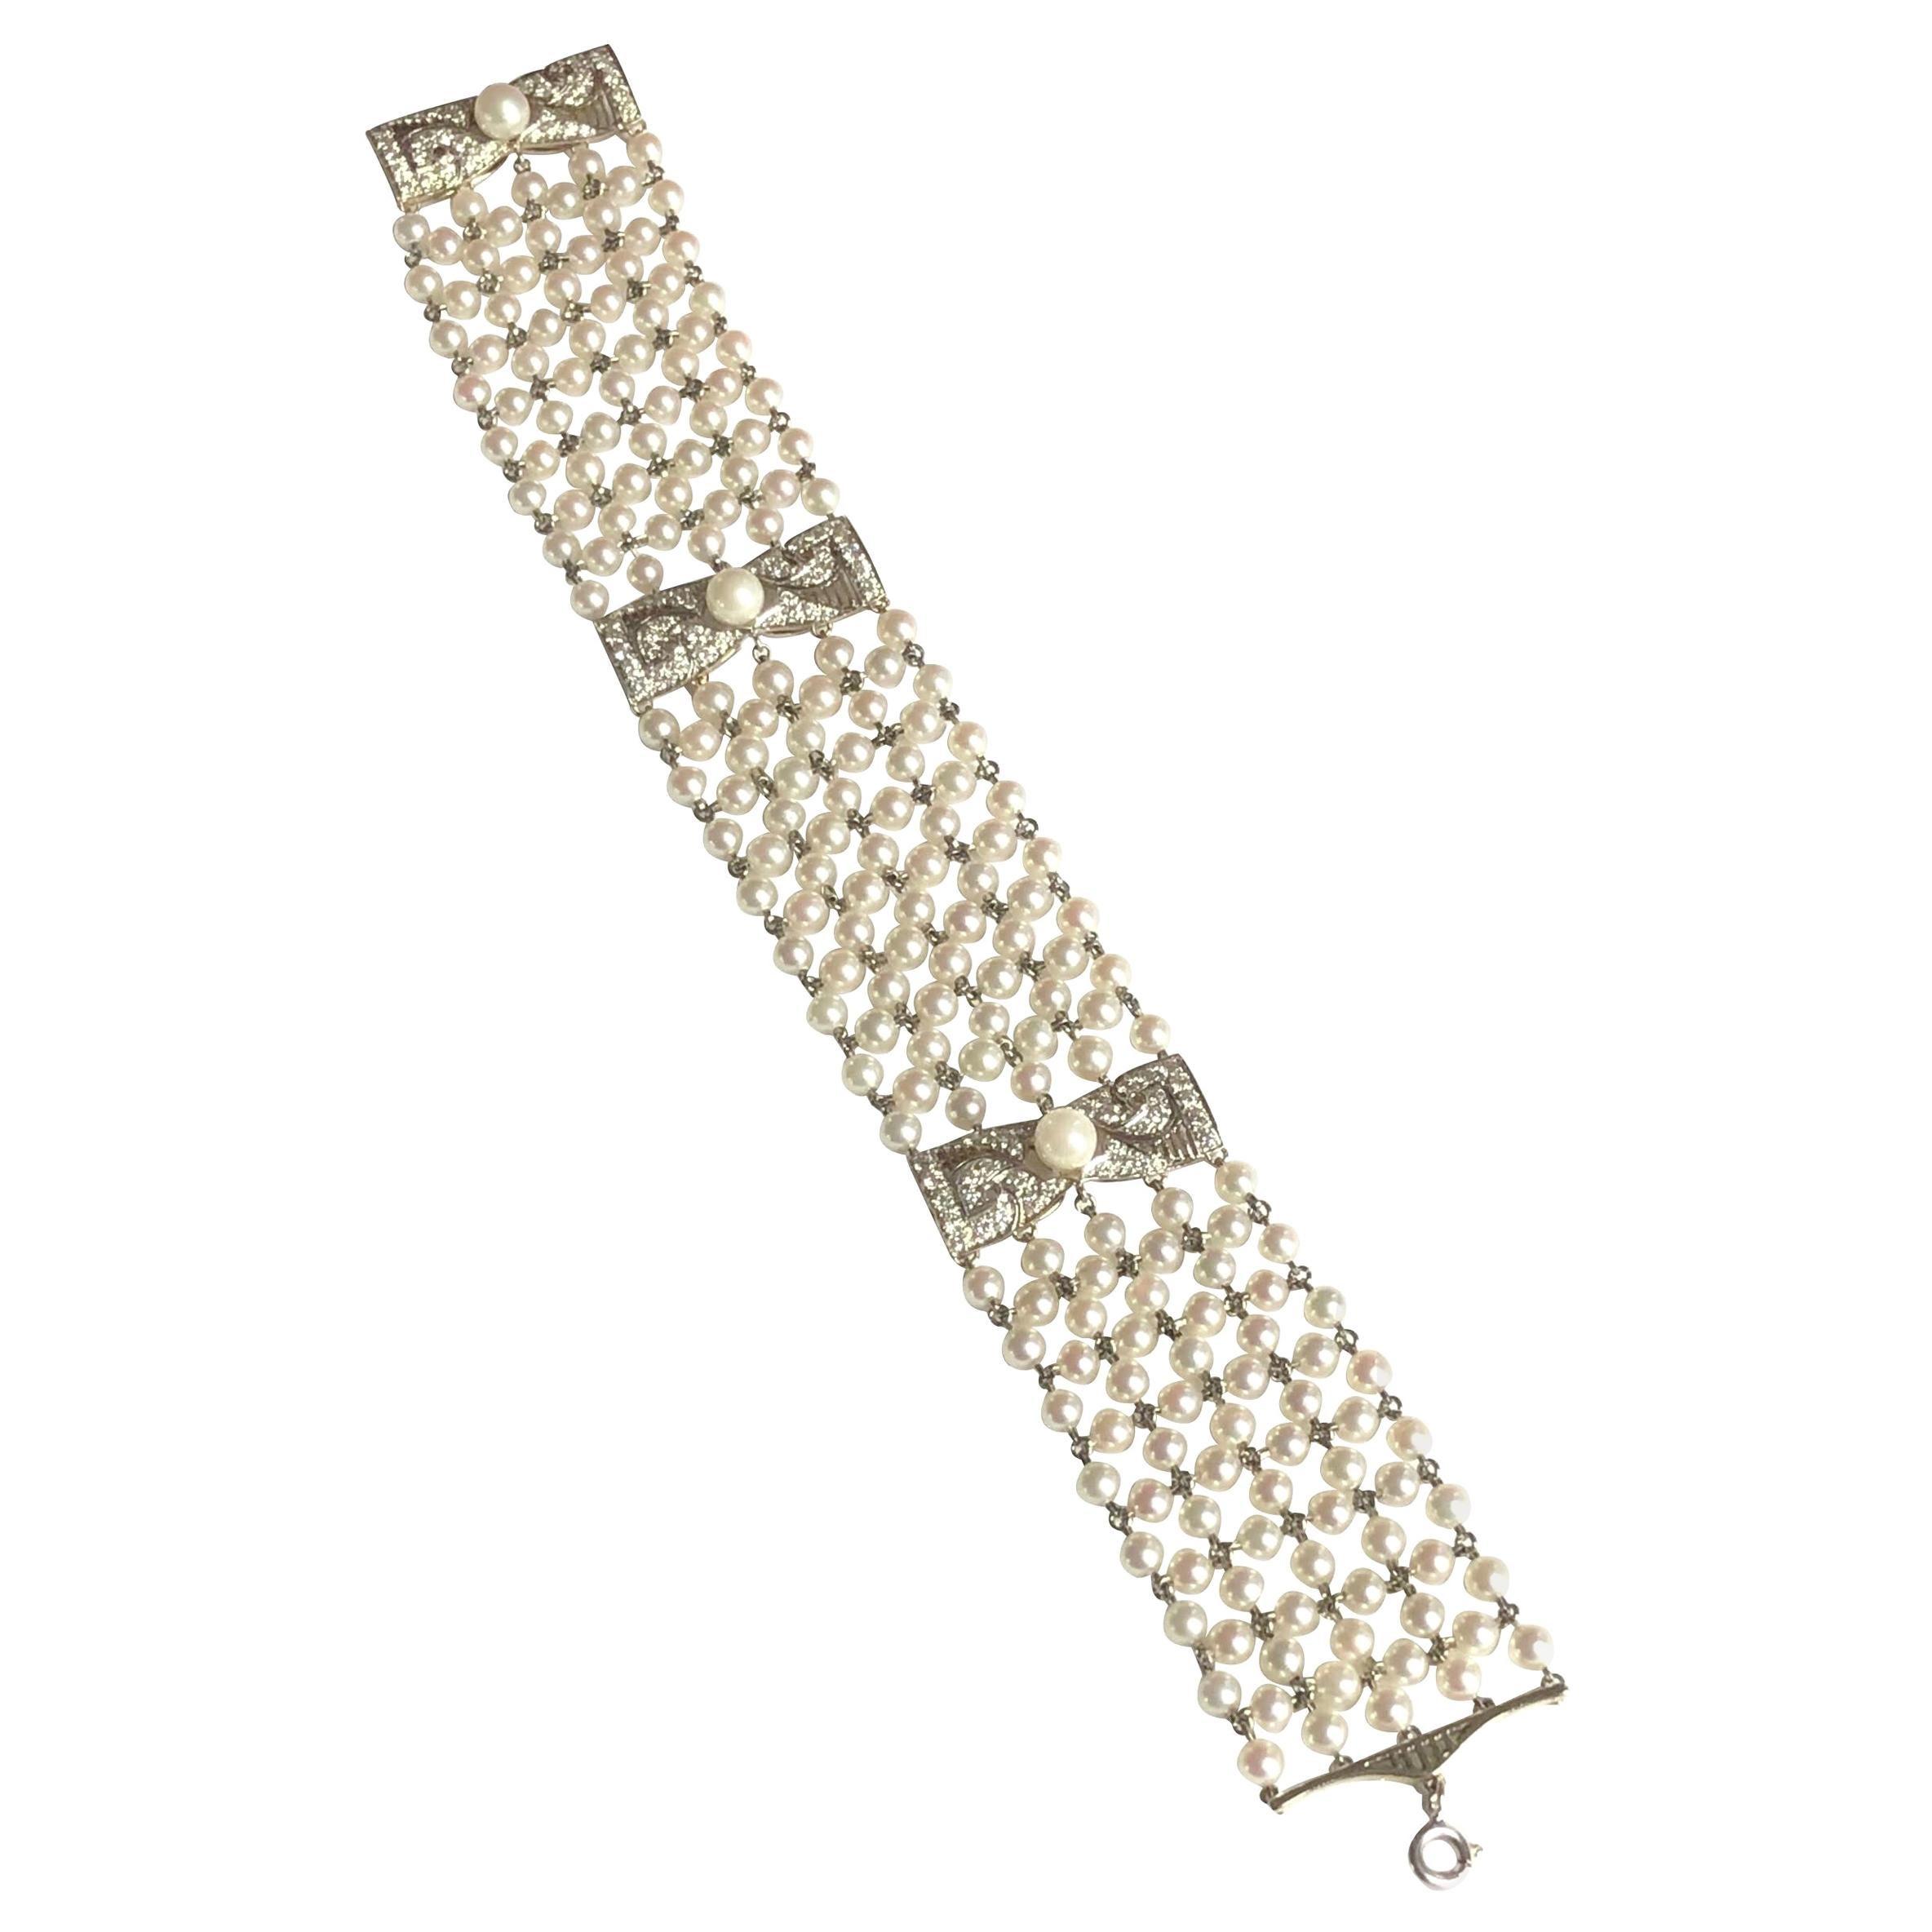 Edwardian Platinum Pearl and Diamond Bracelet